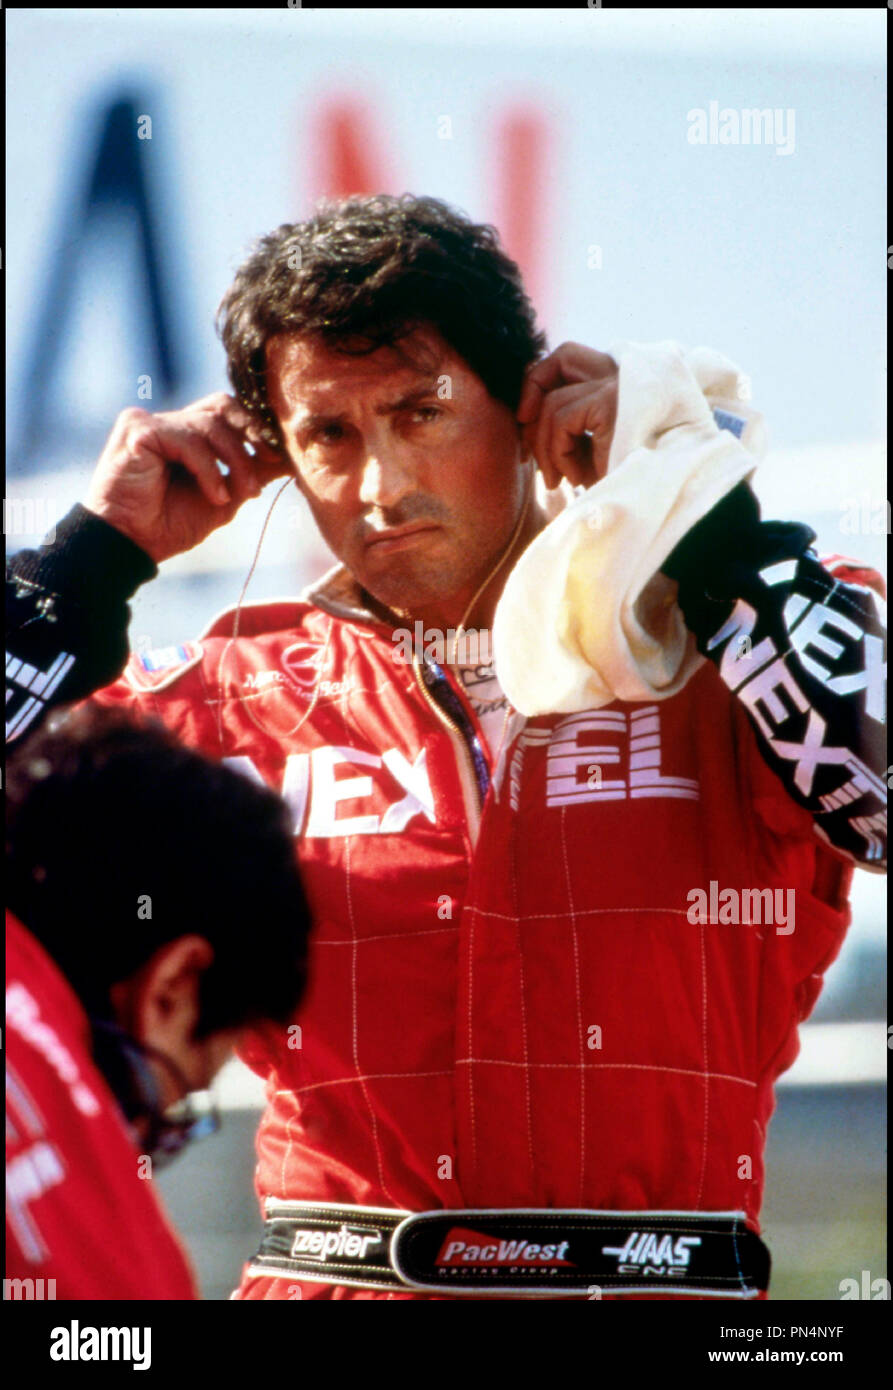 Prod DB © Franchise Pictures / DR DRIVEN (DRIVEN) de Renny Harlin 2001 USA avec Sylvester Stallone pilote, formule 1 - Stock Image